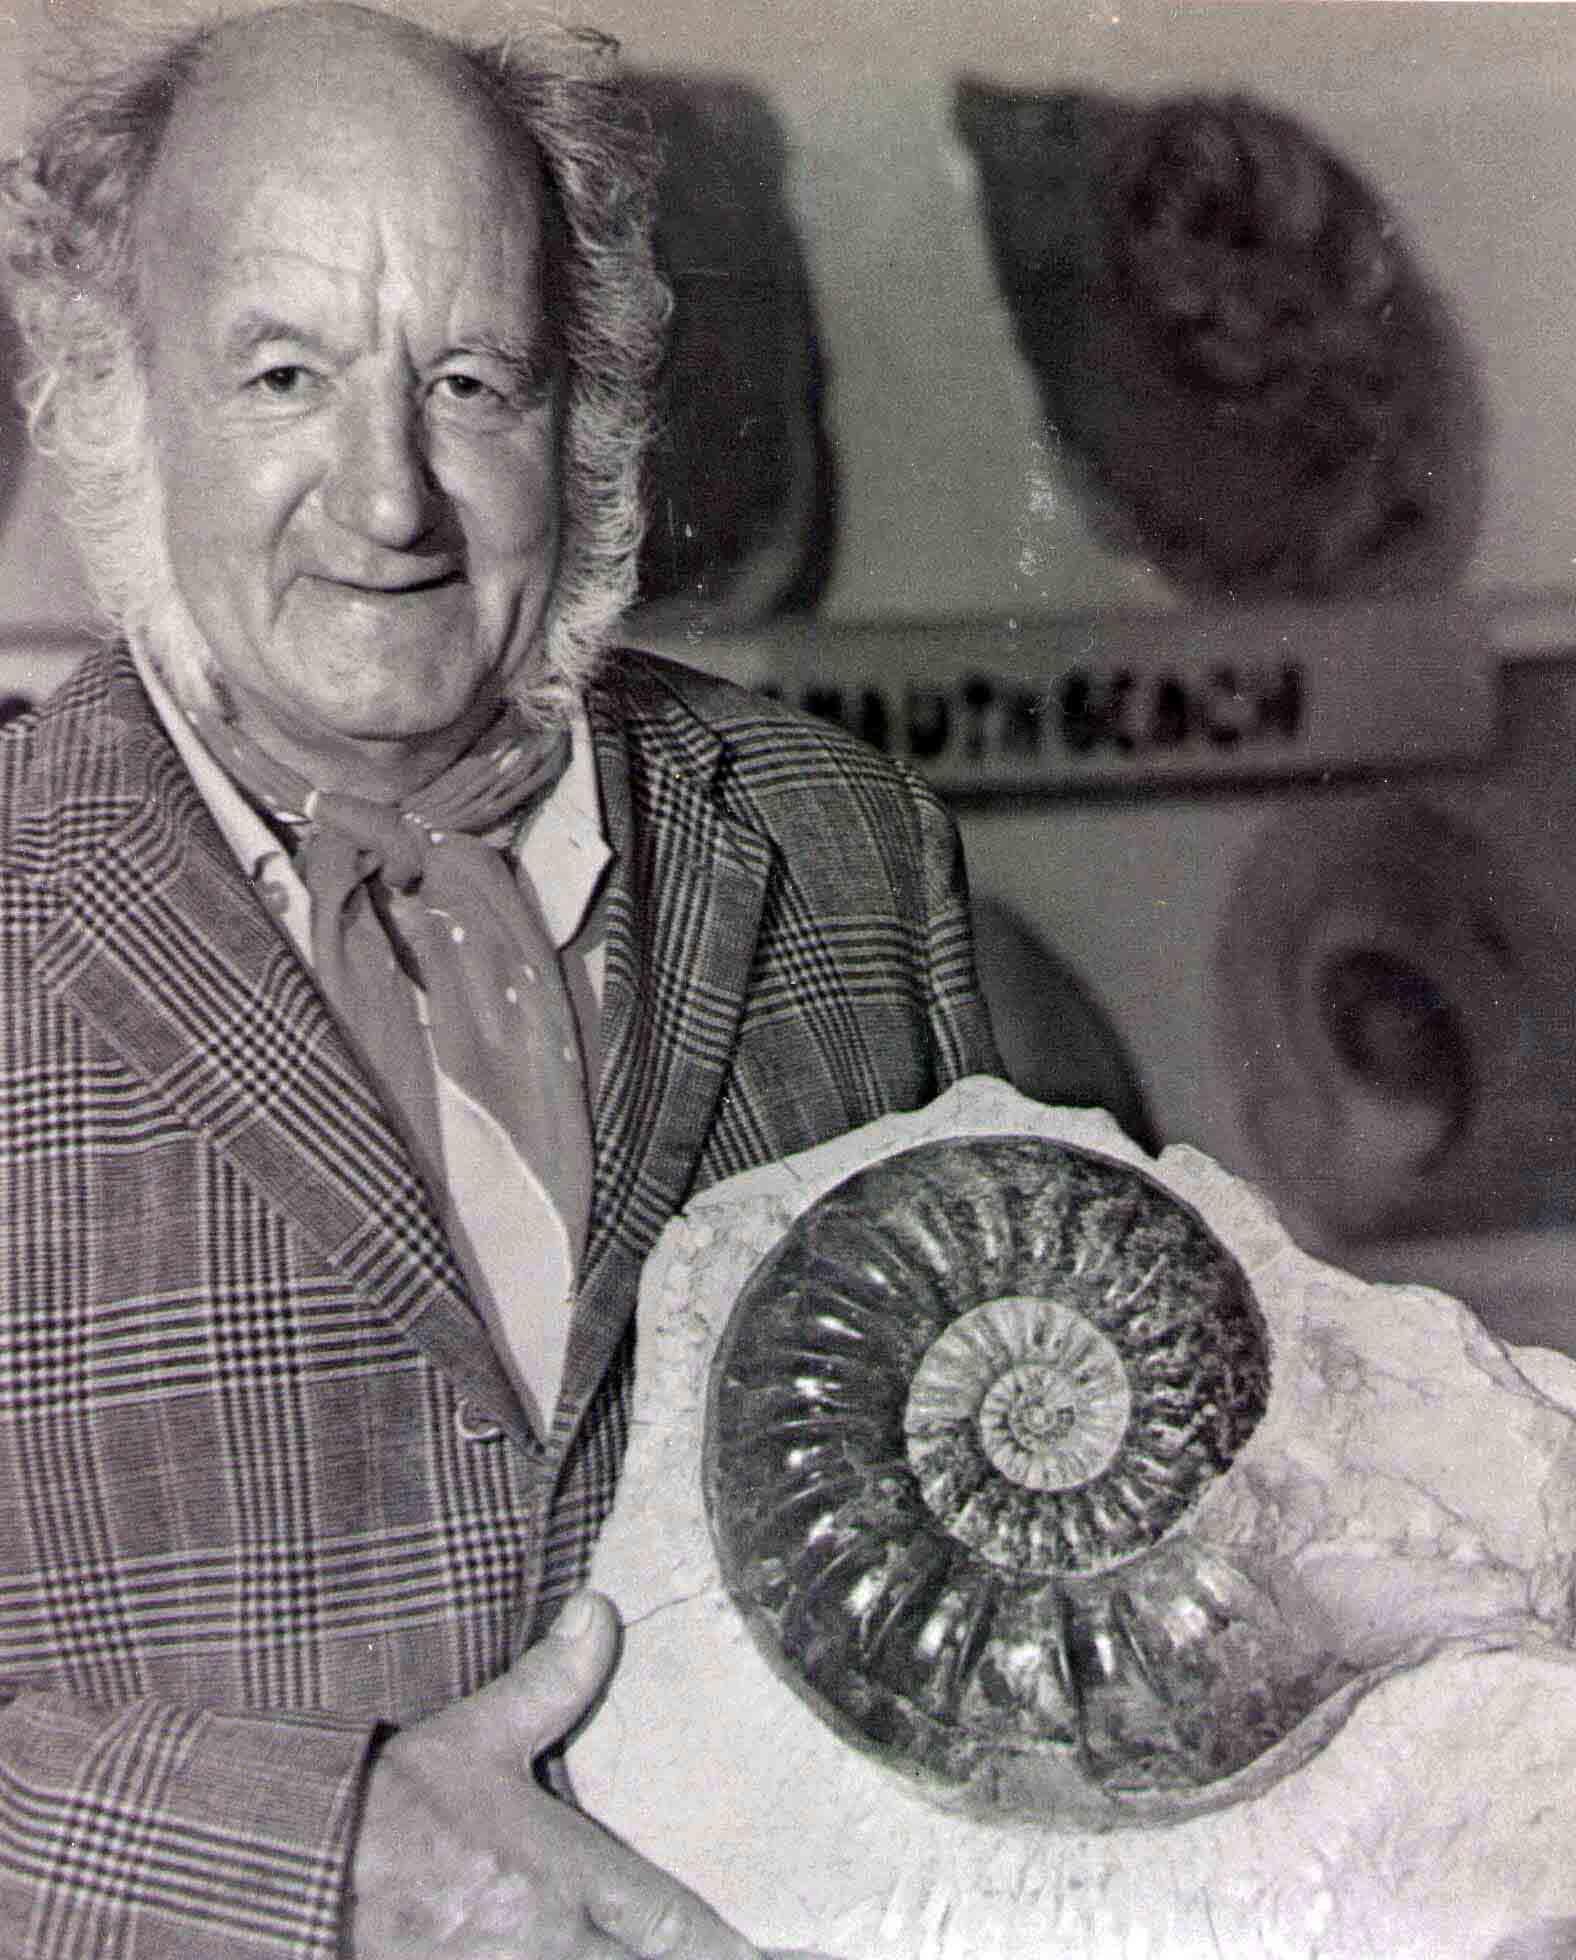 Barney Hansford